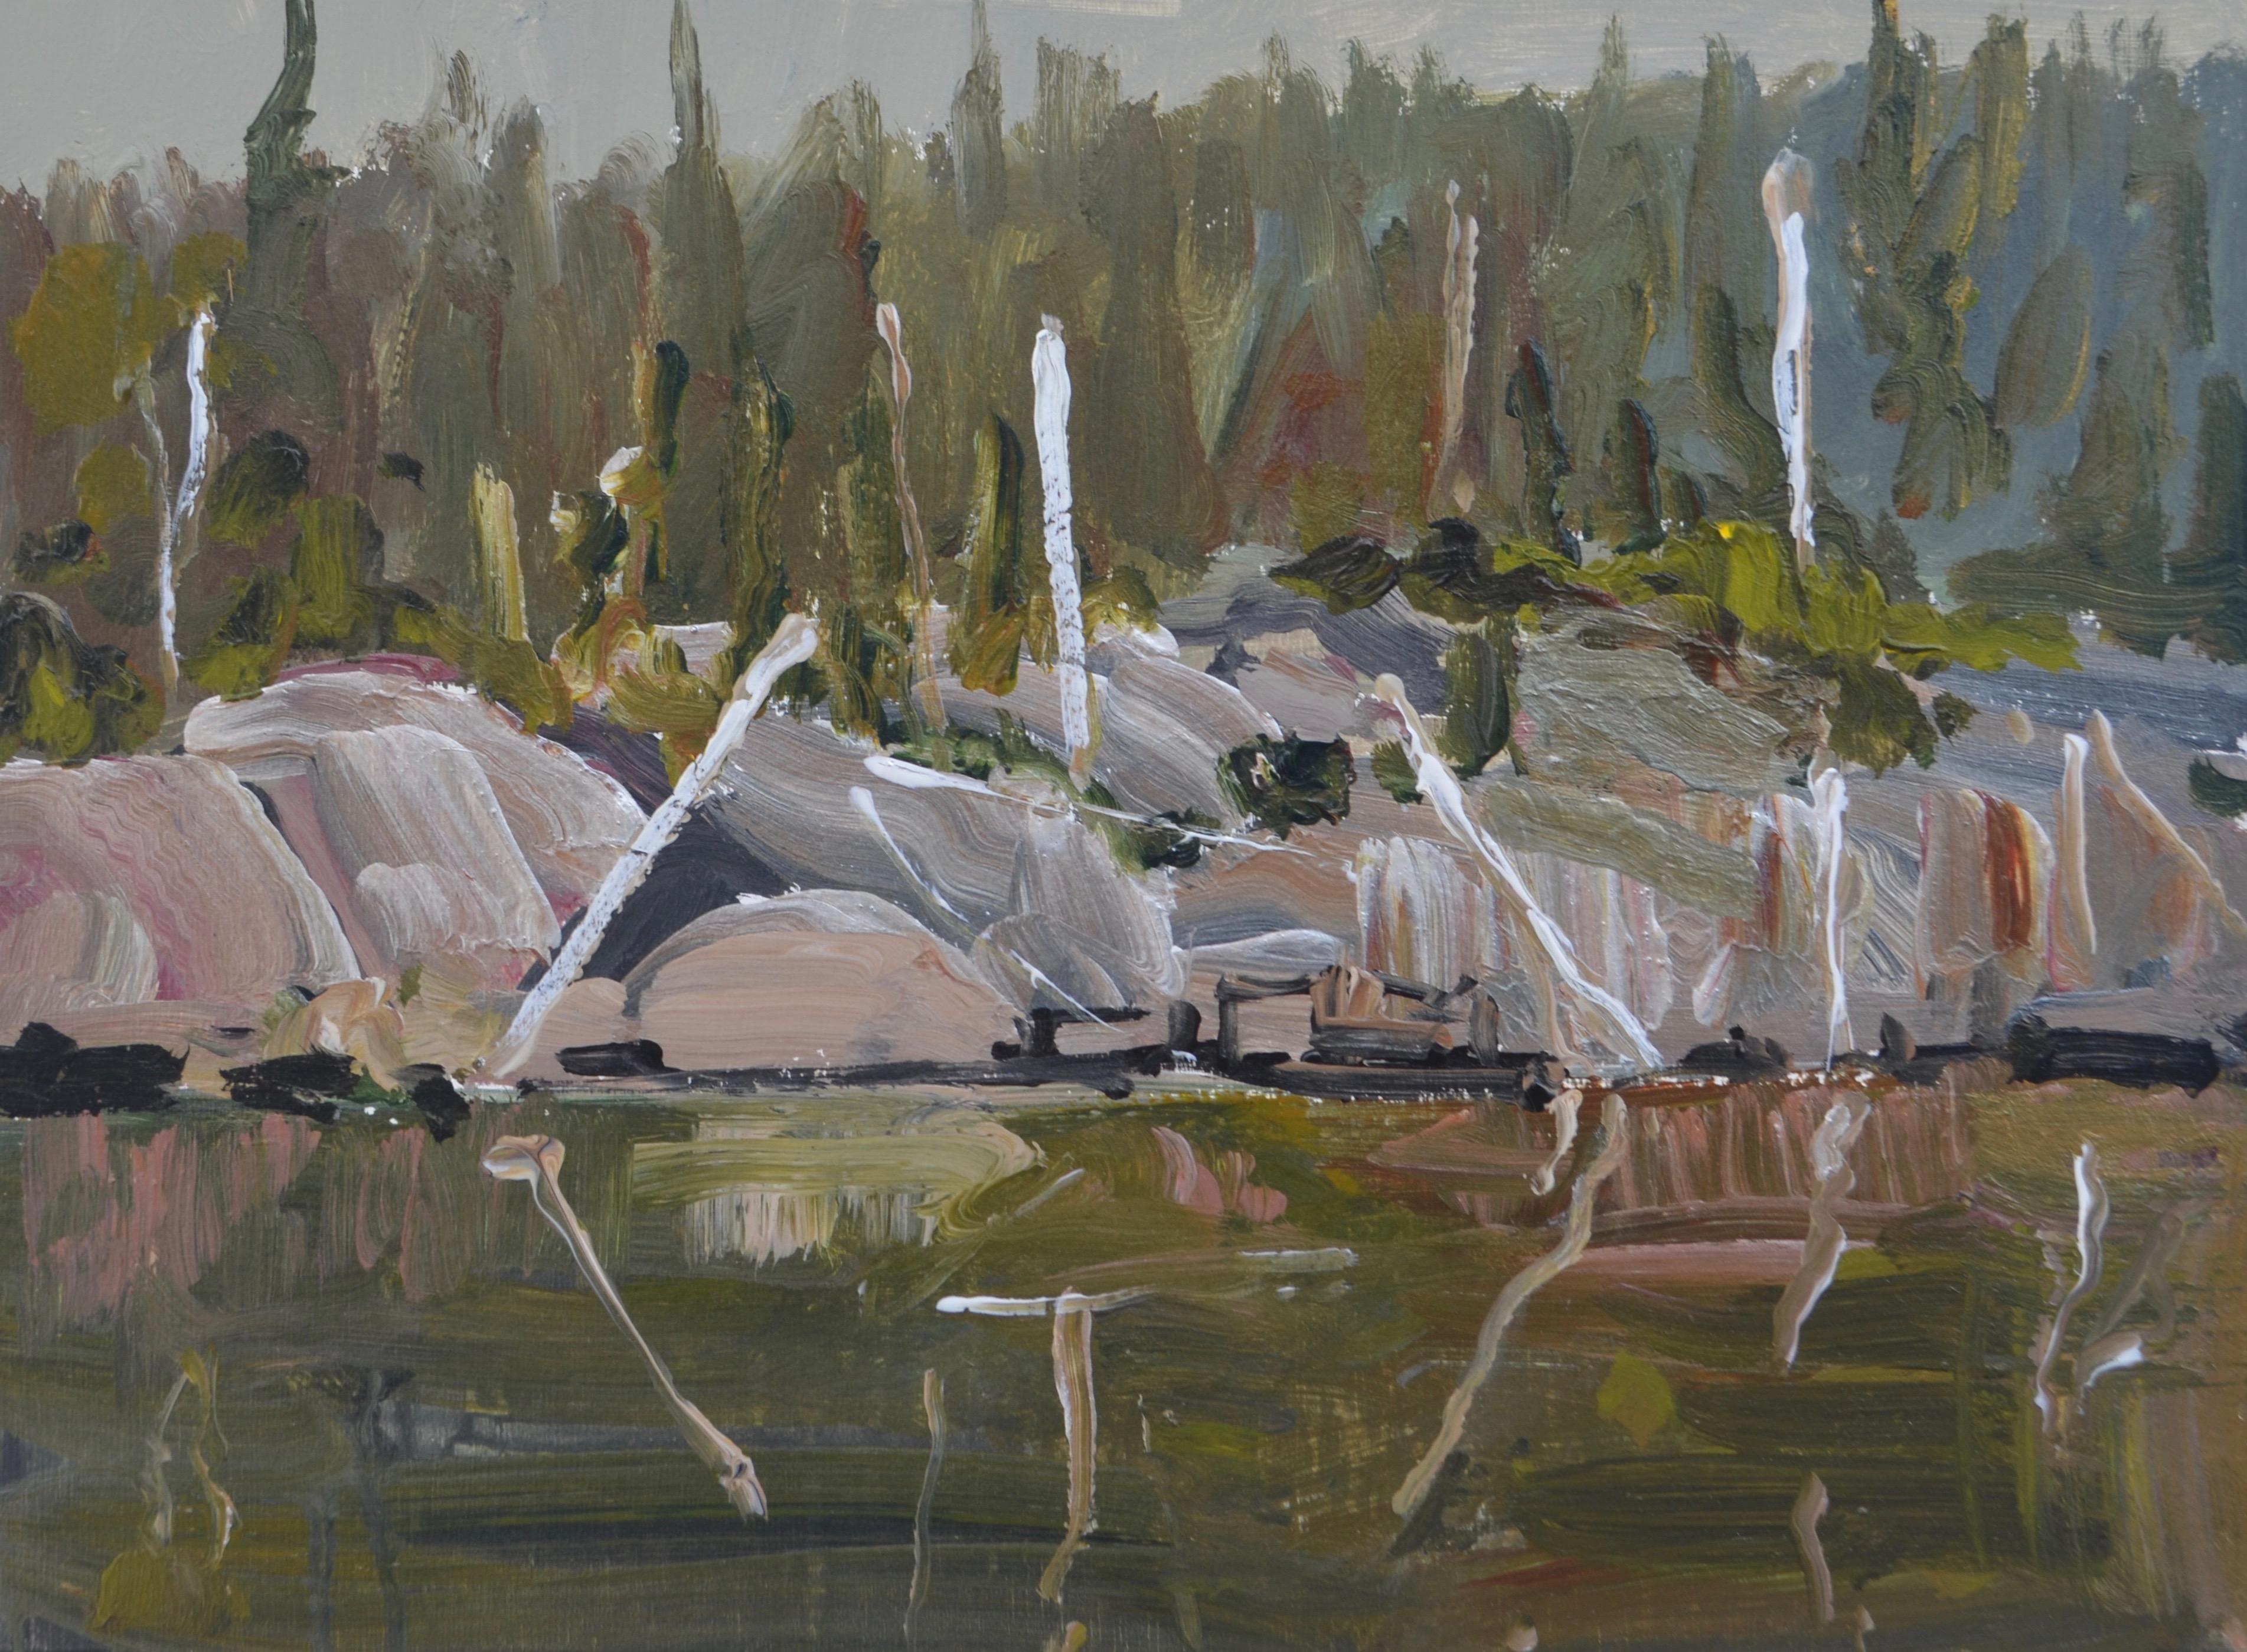 Dead Birches acrylic panel 11_ x 14_